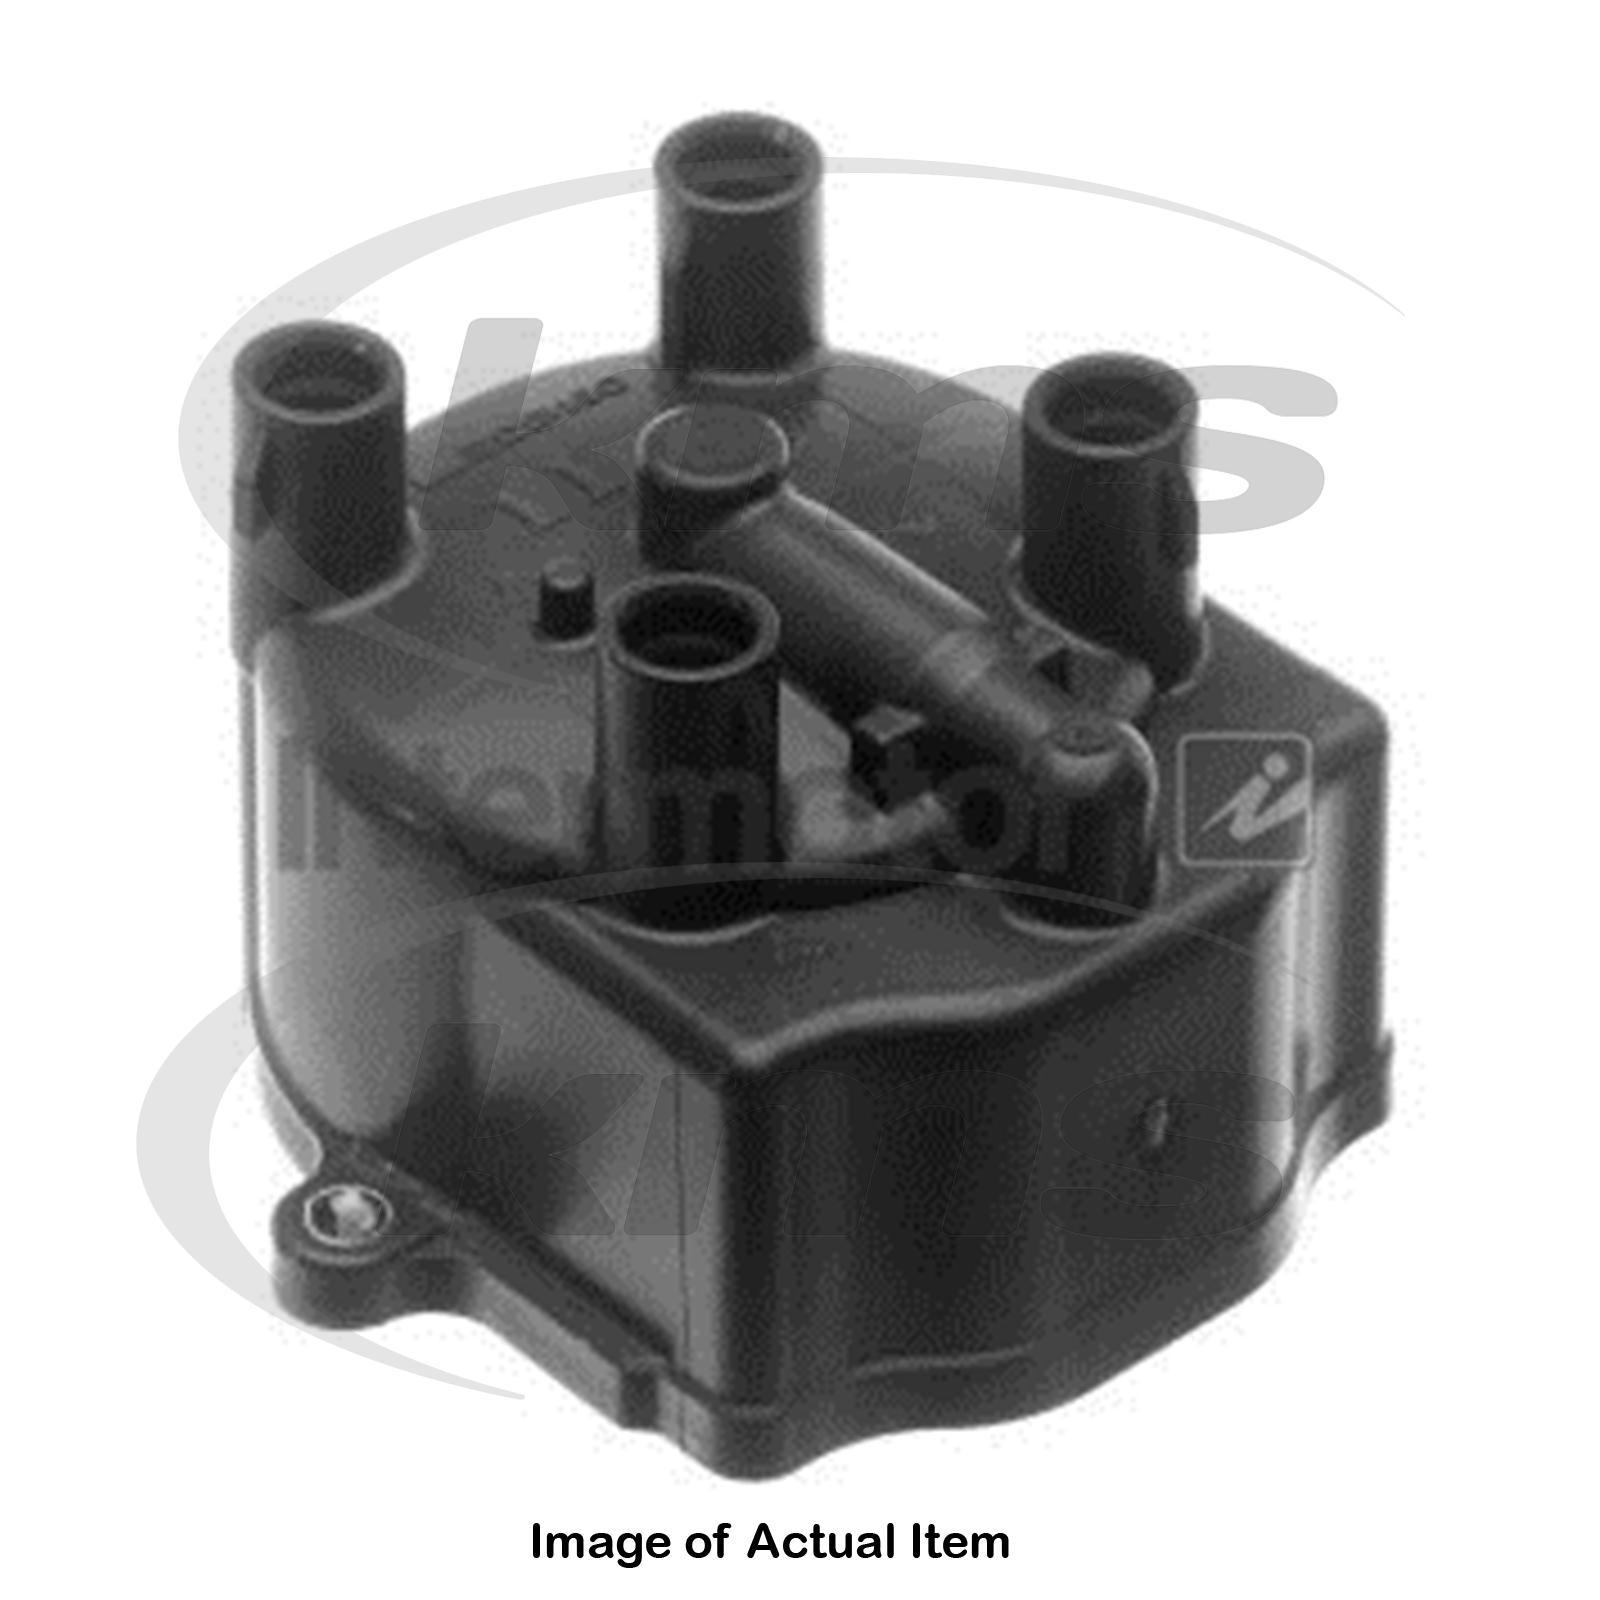 BRAND NEW GENUINE Bosch Distributor Cap 1235522413 5 YEAR WARRANTY